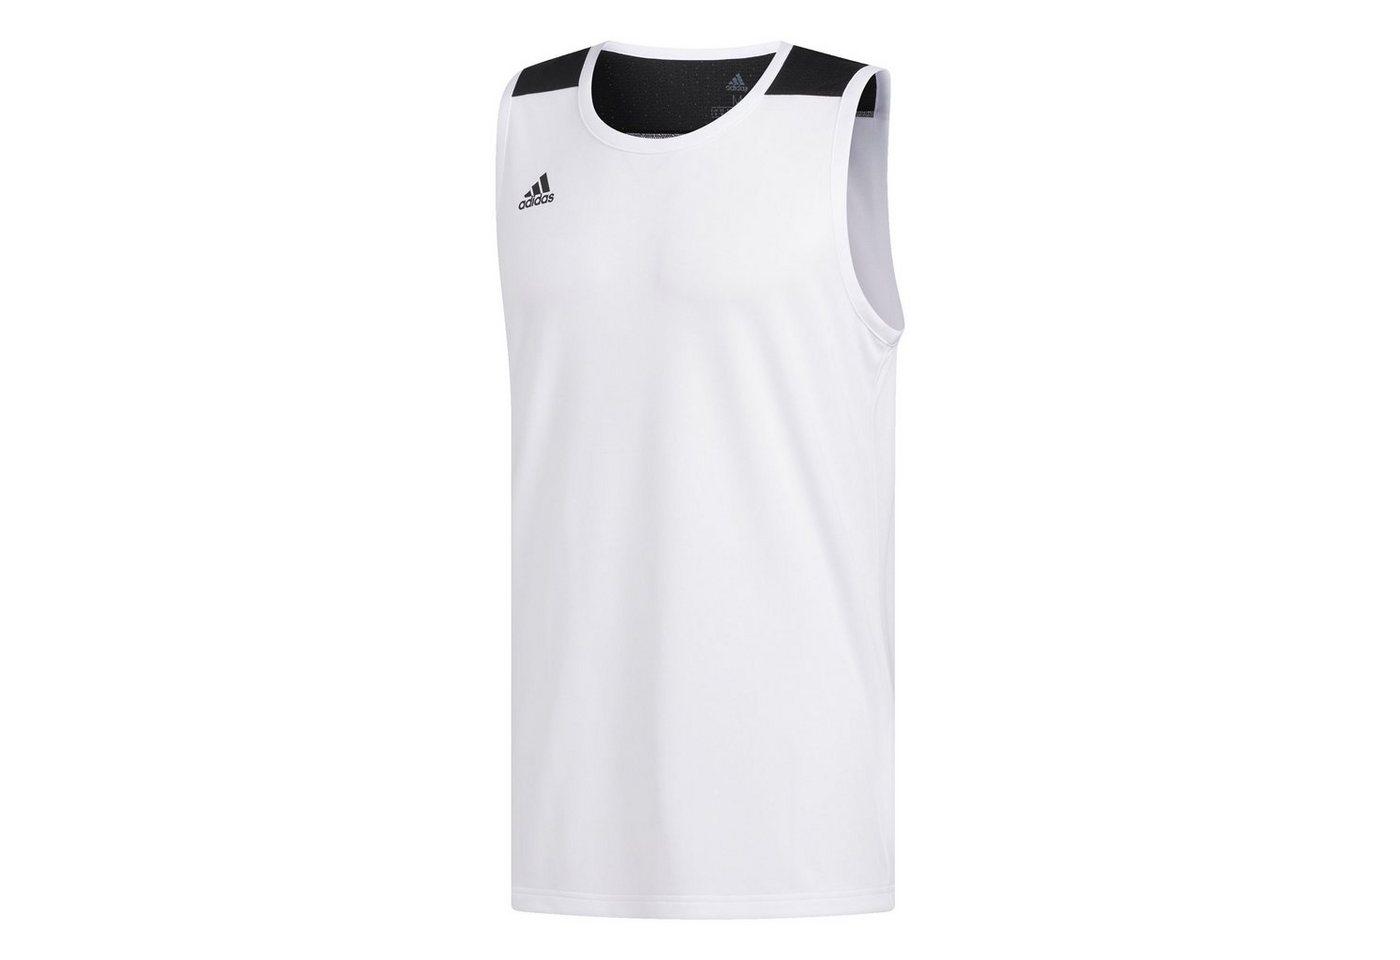 adidas Performance Basketballtrikot »Creator 365 Jersey«   Sportbekleidung > Trikots > Basketballtrikots   Weiß   Polyester   adidas Performance